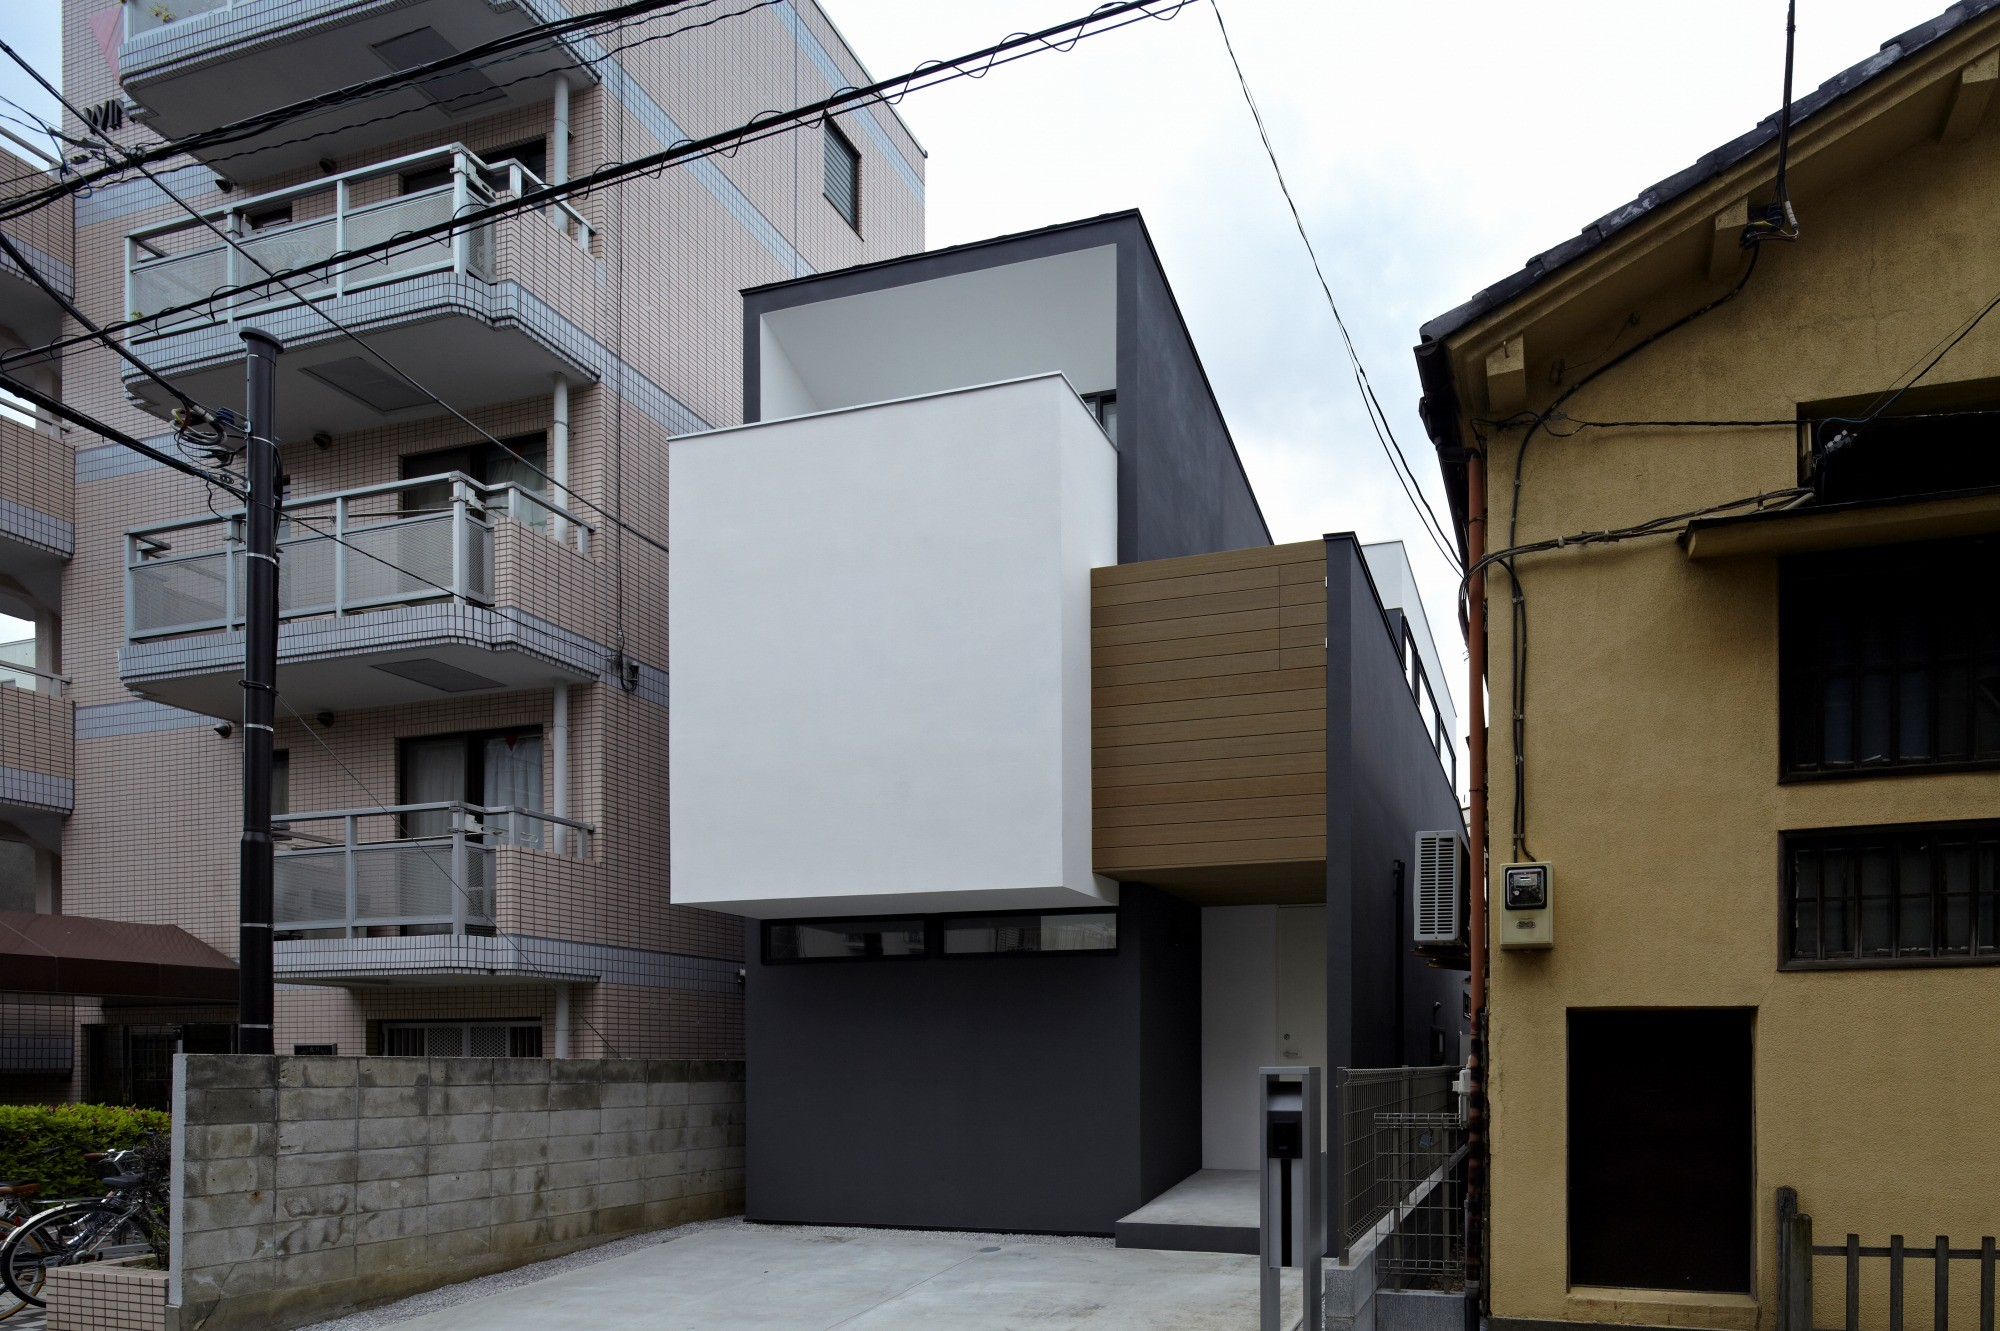 NN House / Kozo Yamamoto, © Koichi Torimura